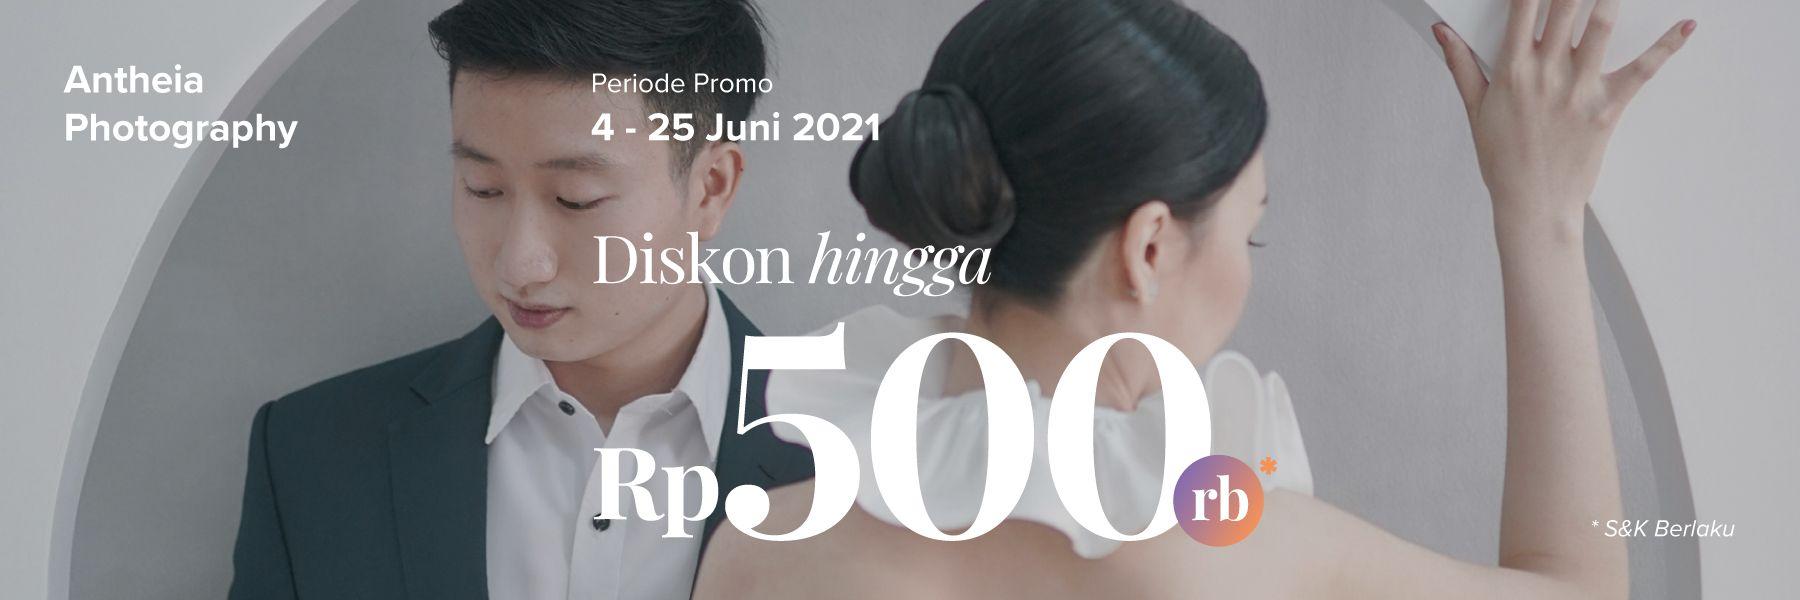 Promo Photography Diskon Rp 500,000 di Antheia Photography!